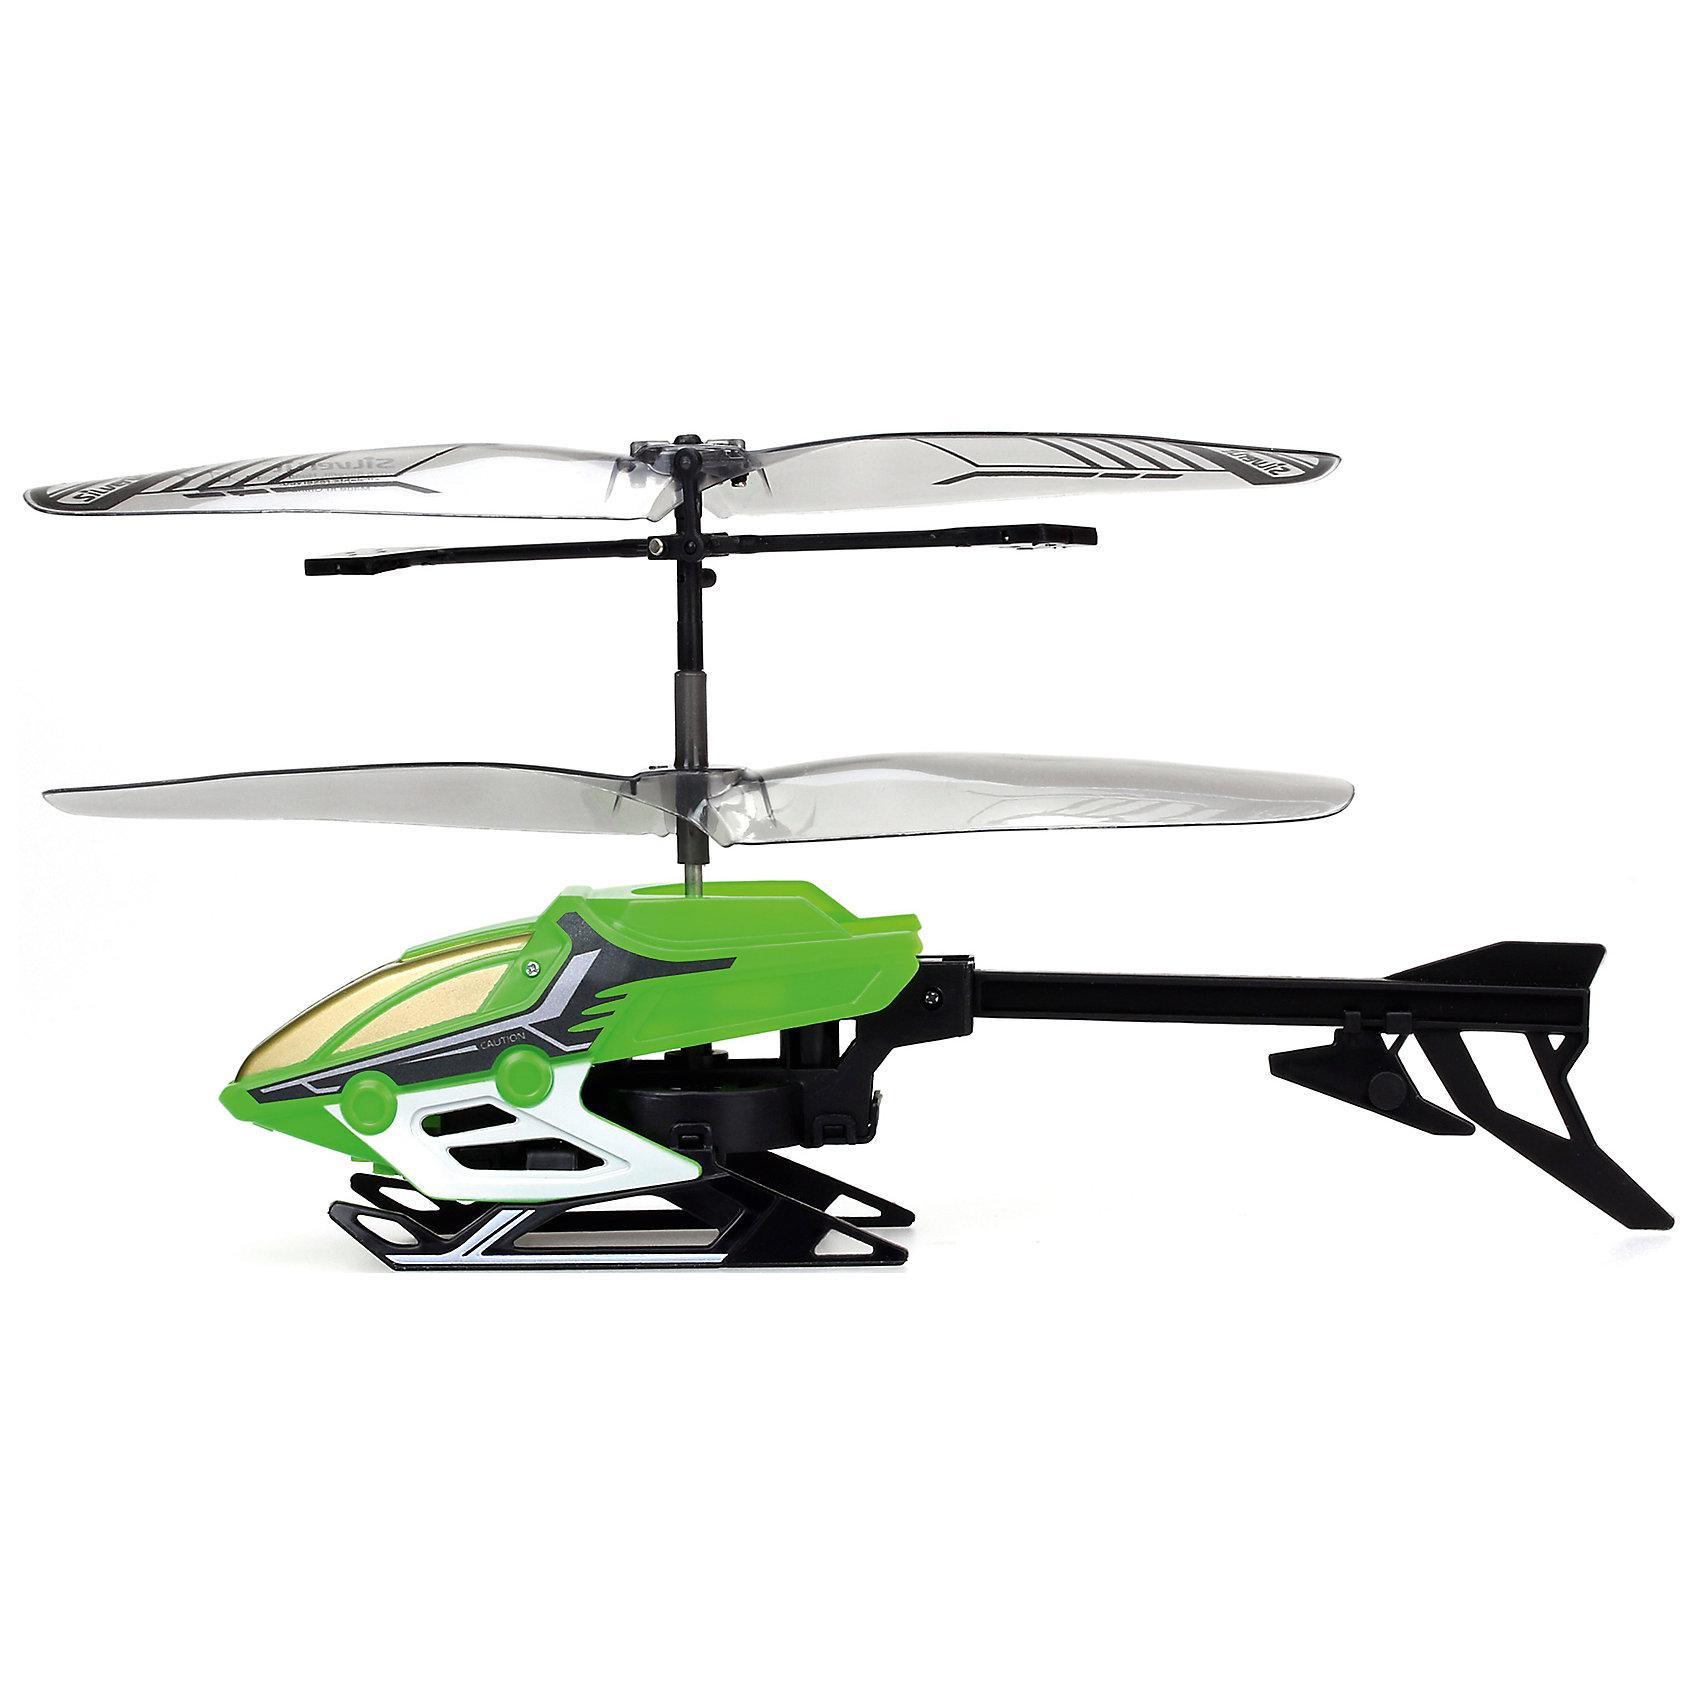 Silverlit Вертолет 2-х канальный Alpha Y, Silverlit 2 канальный вертолет silverlit heli armor с защитными кольцами